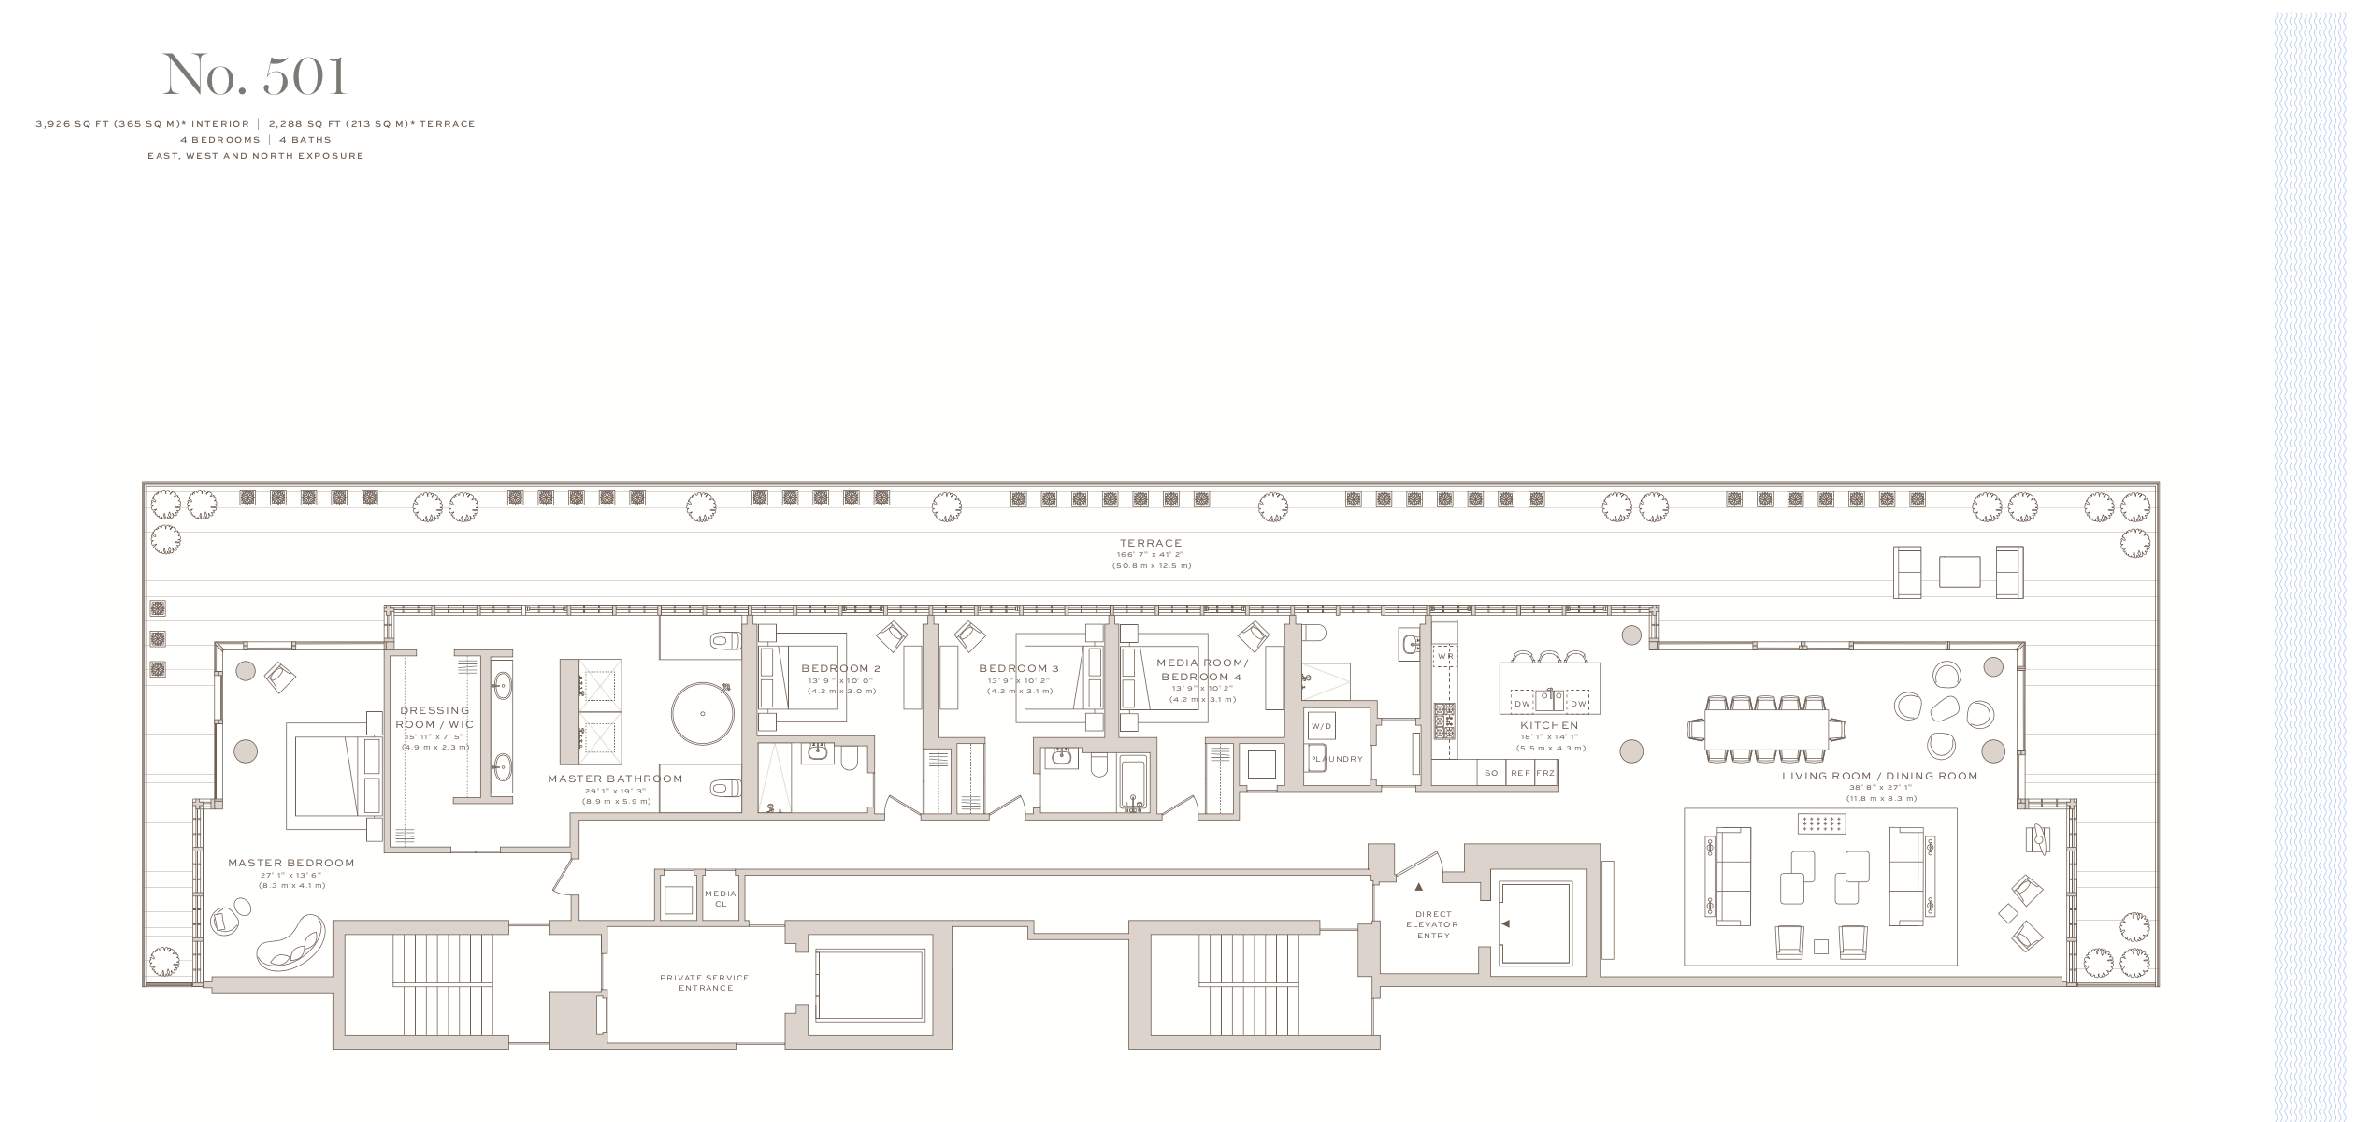 Arte Surfside | Residence 501| 4 Bedrooms |3,926 SF SF